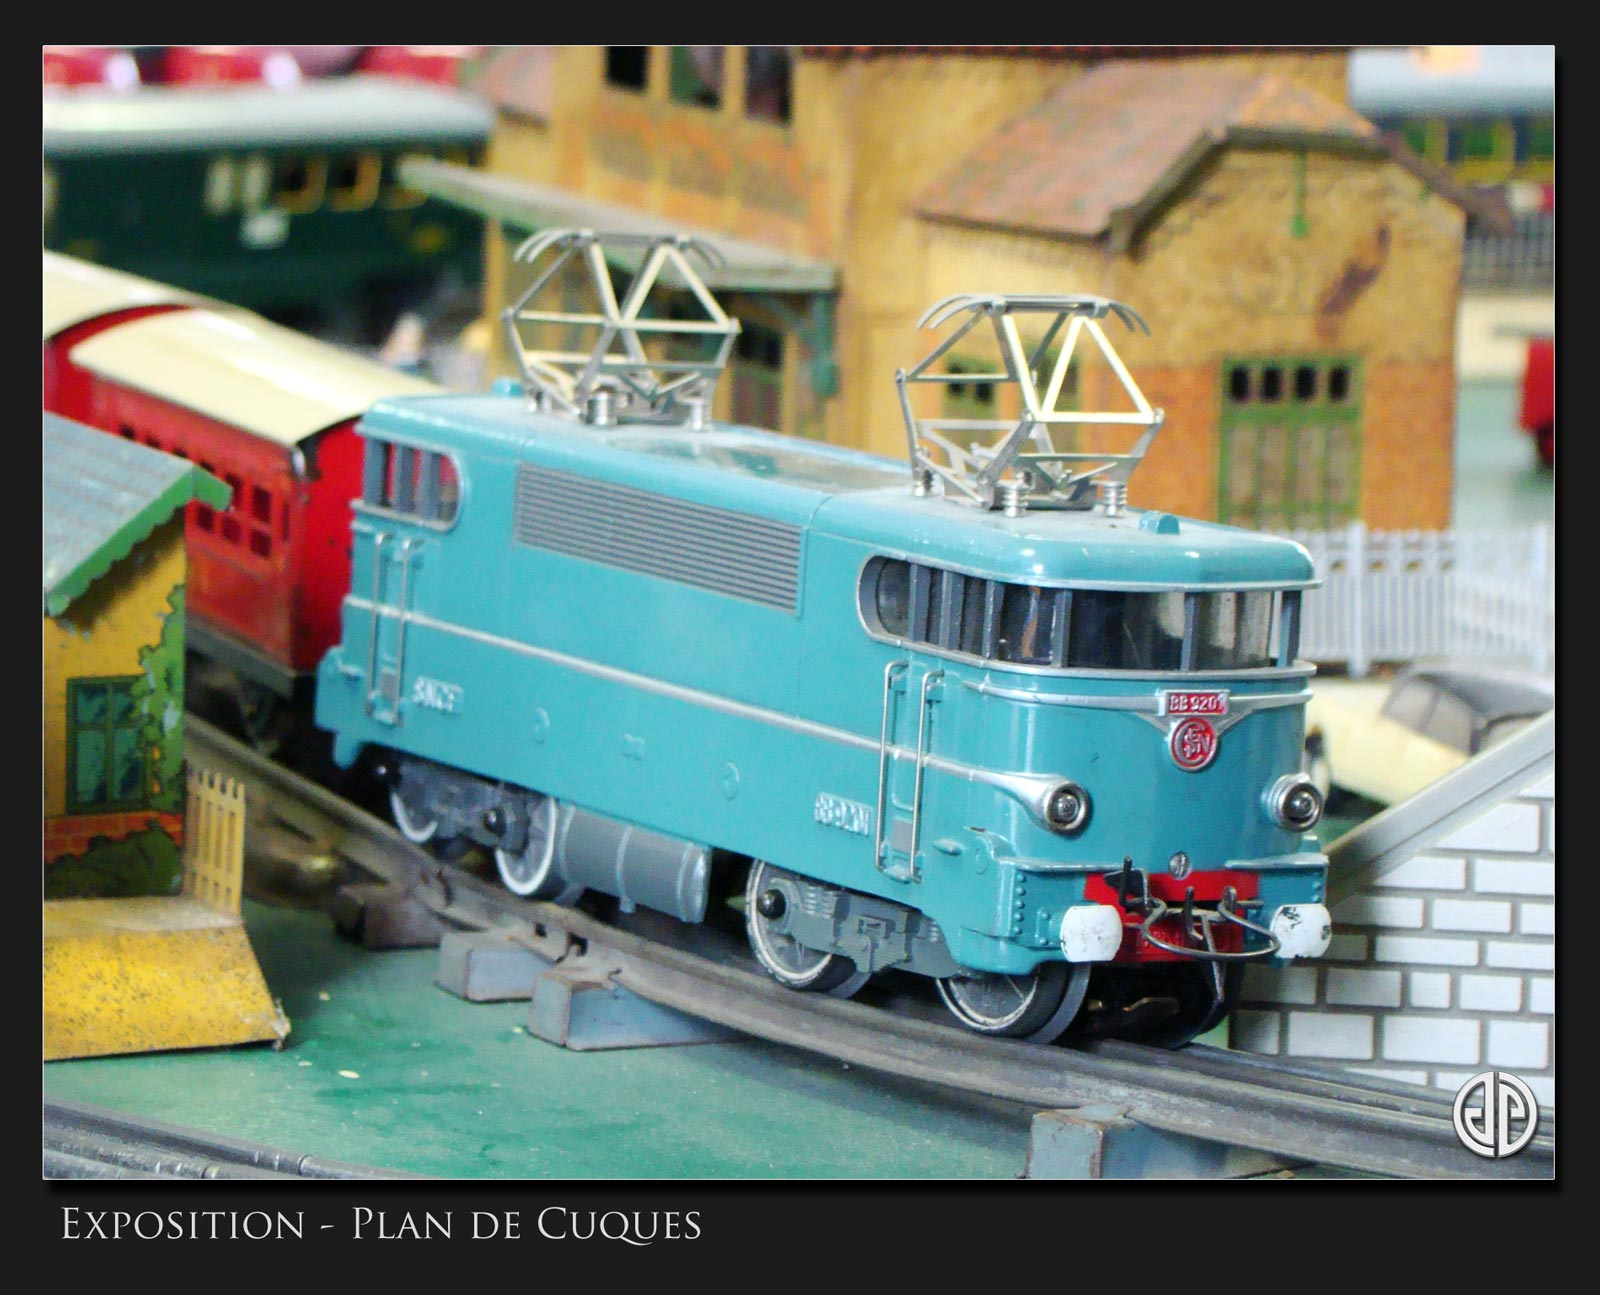 Expo-ferroviaire-Plan-de-Cuques-01